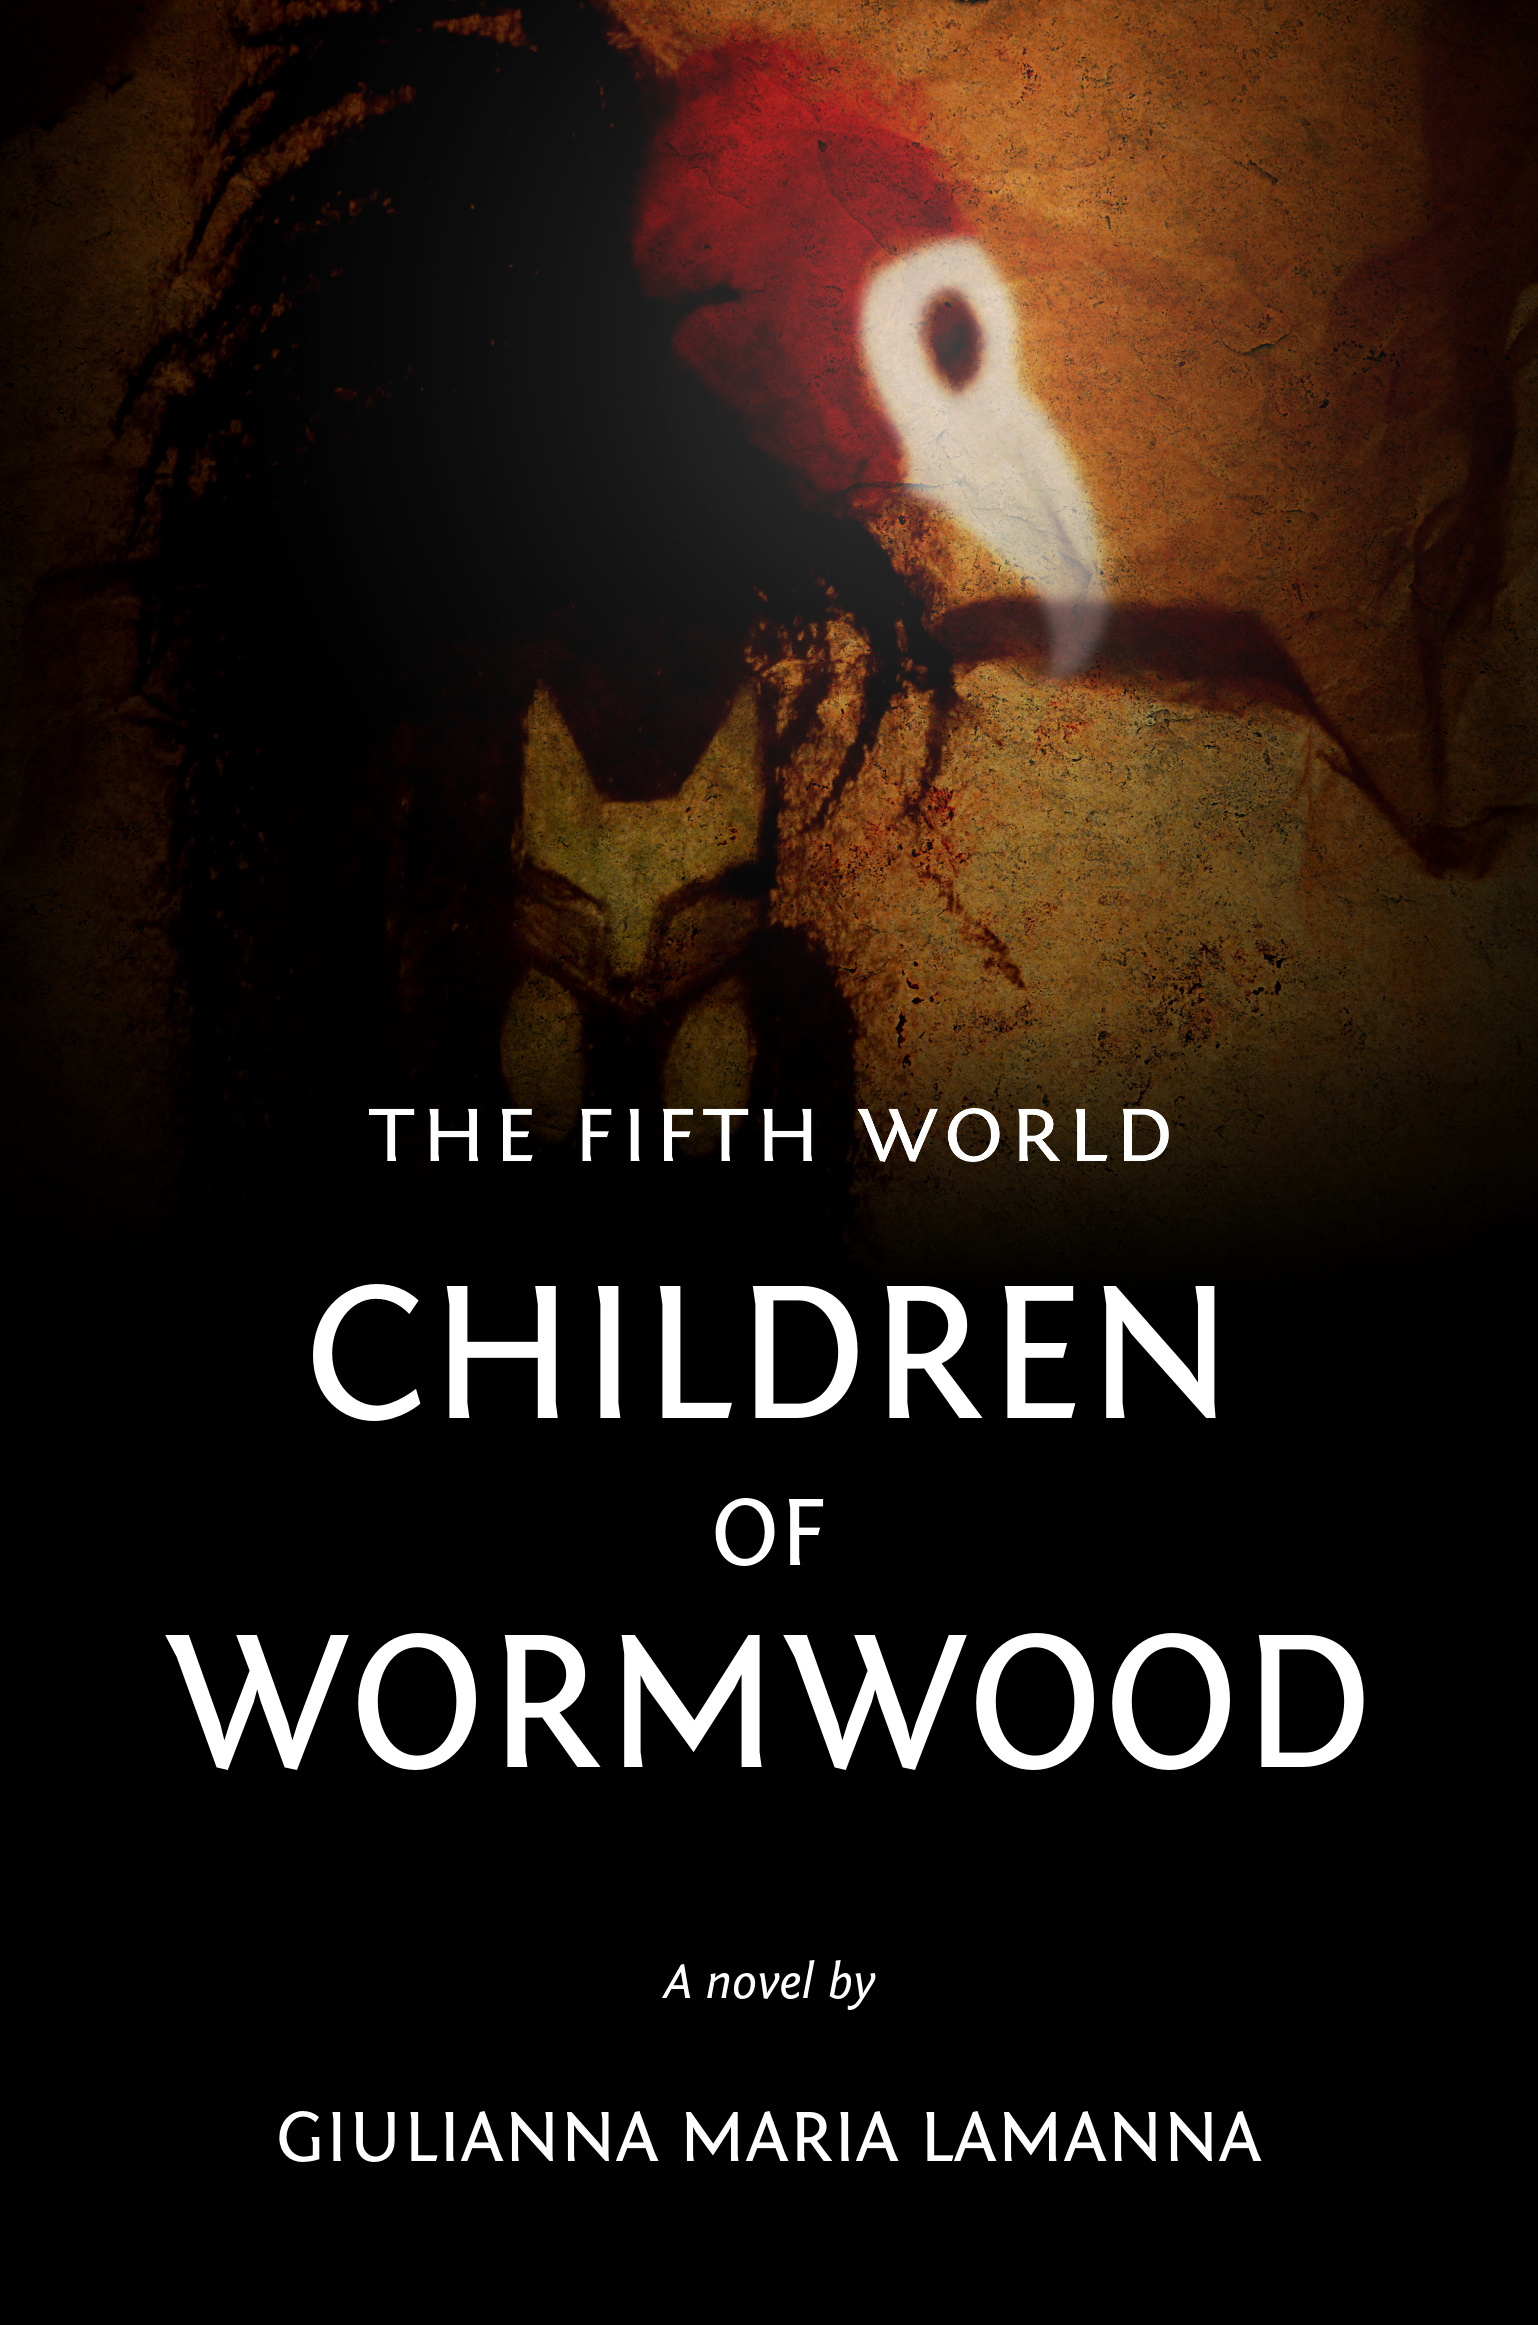 Children of Wormwood